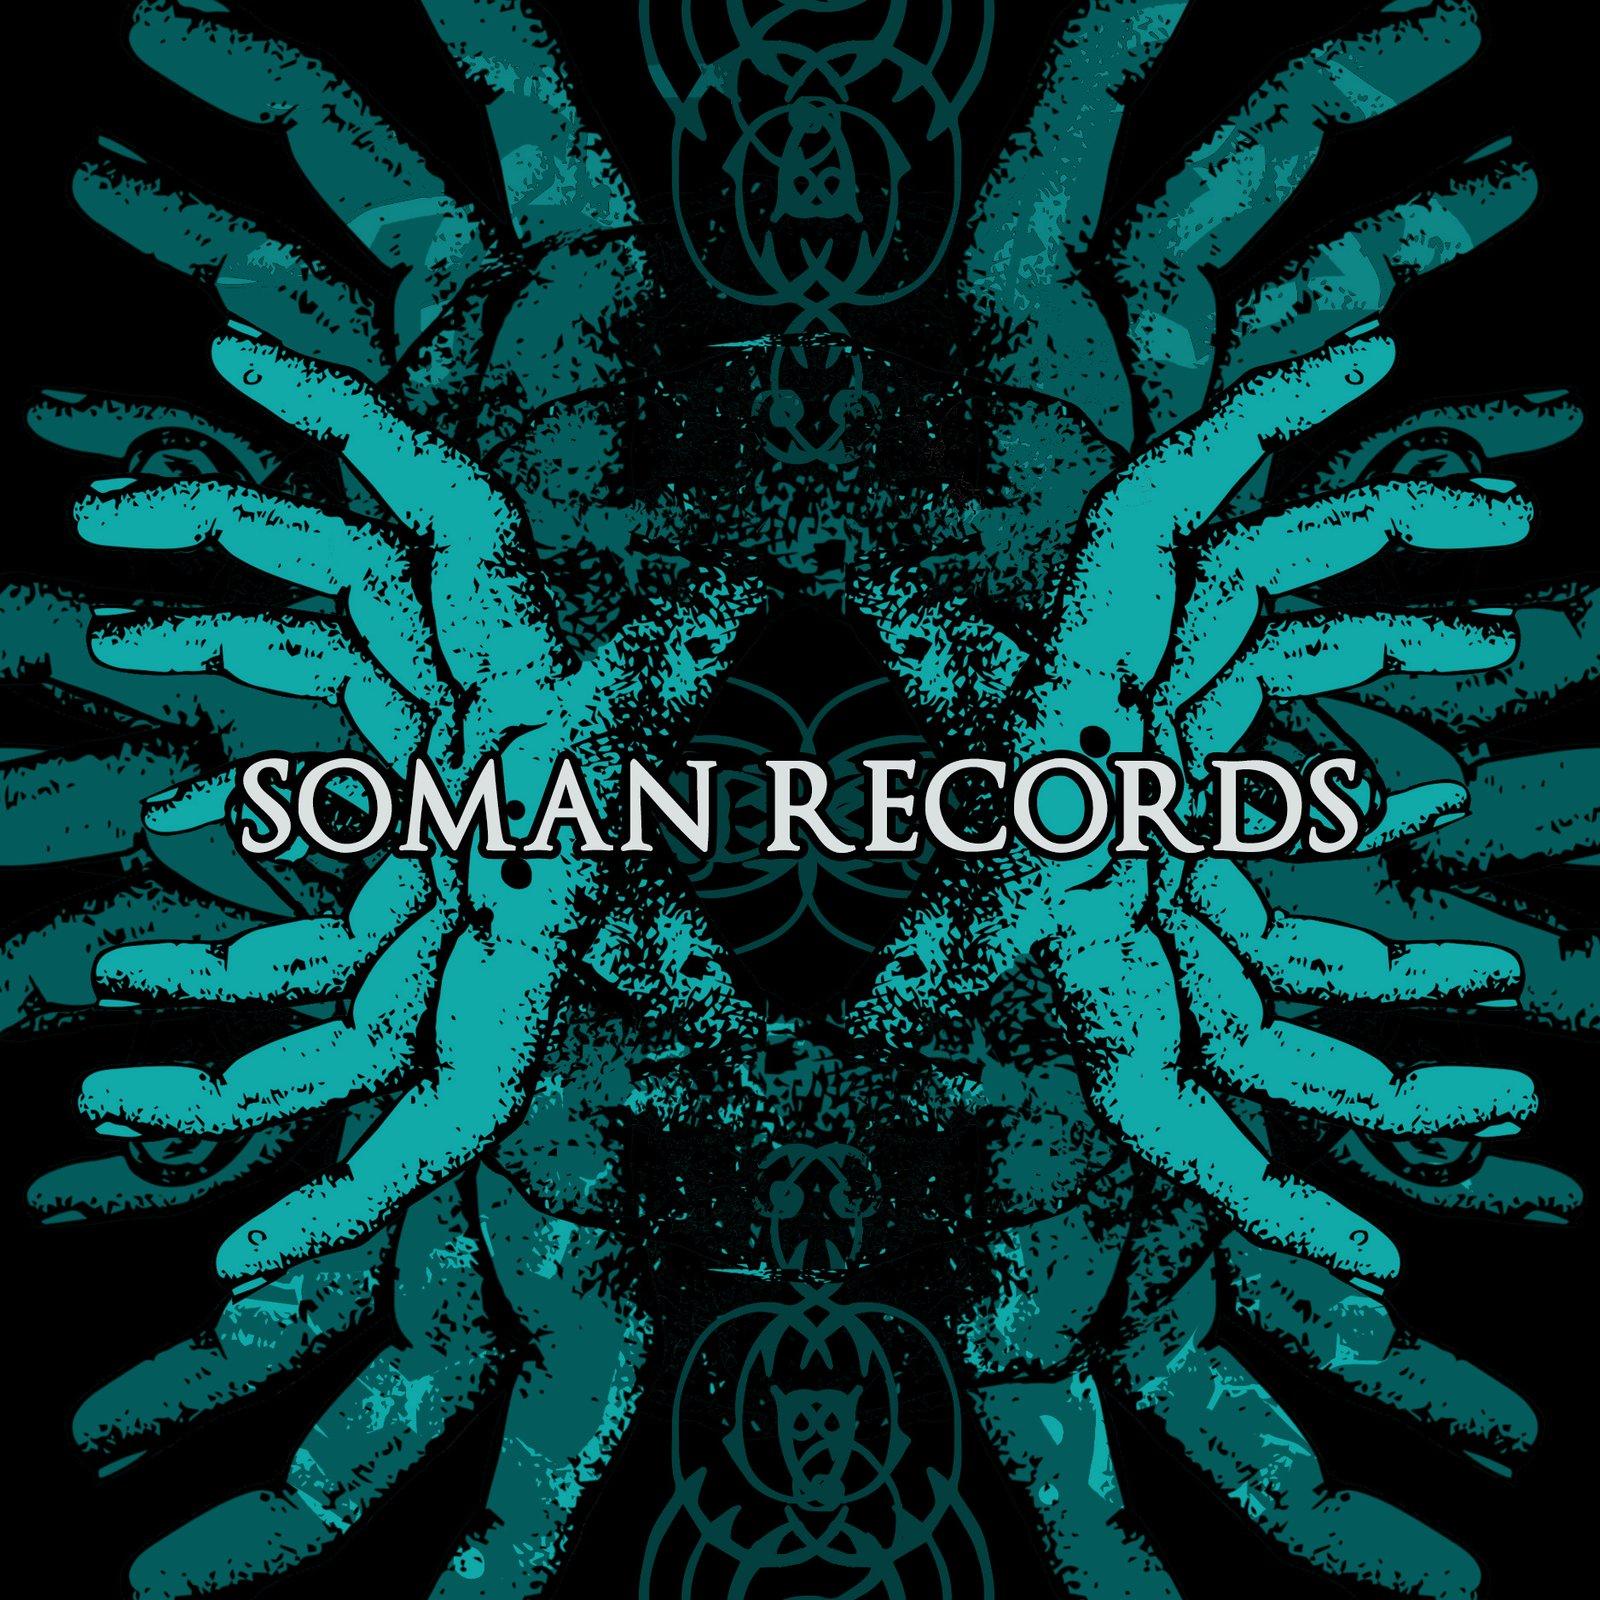 Soman Records